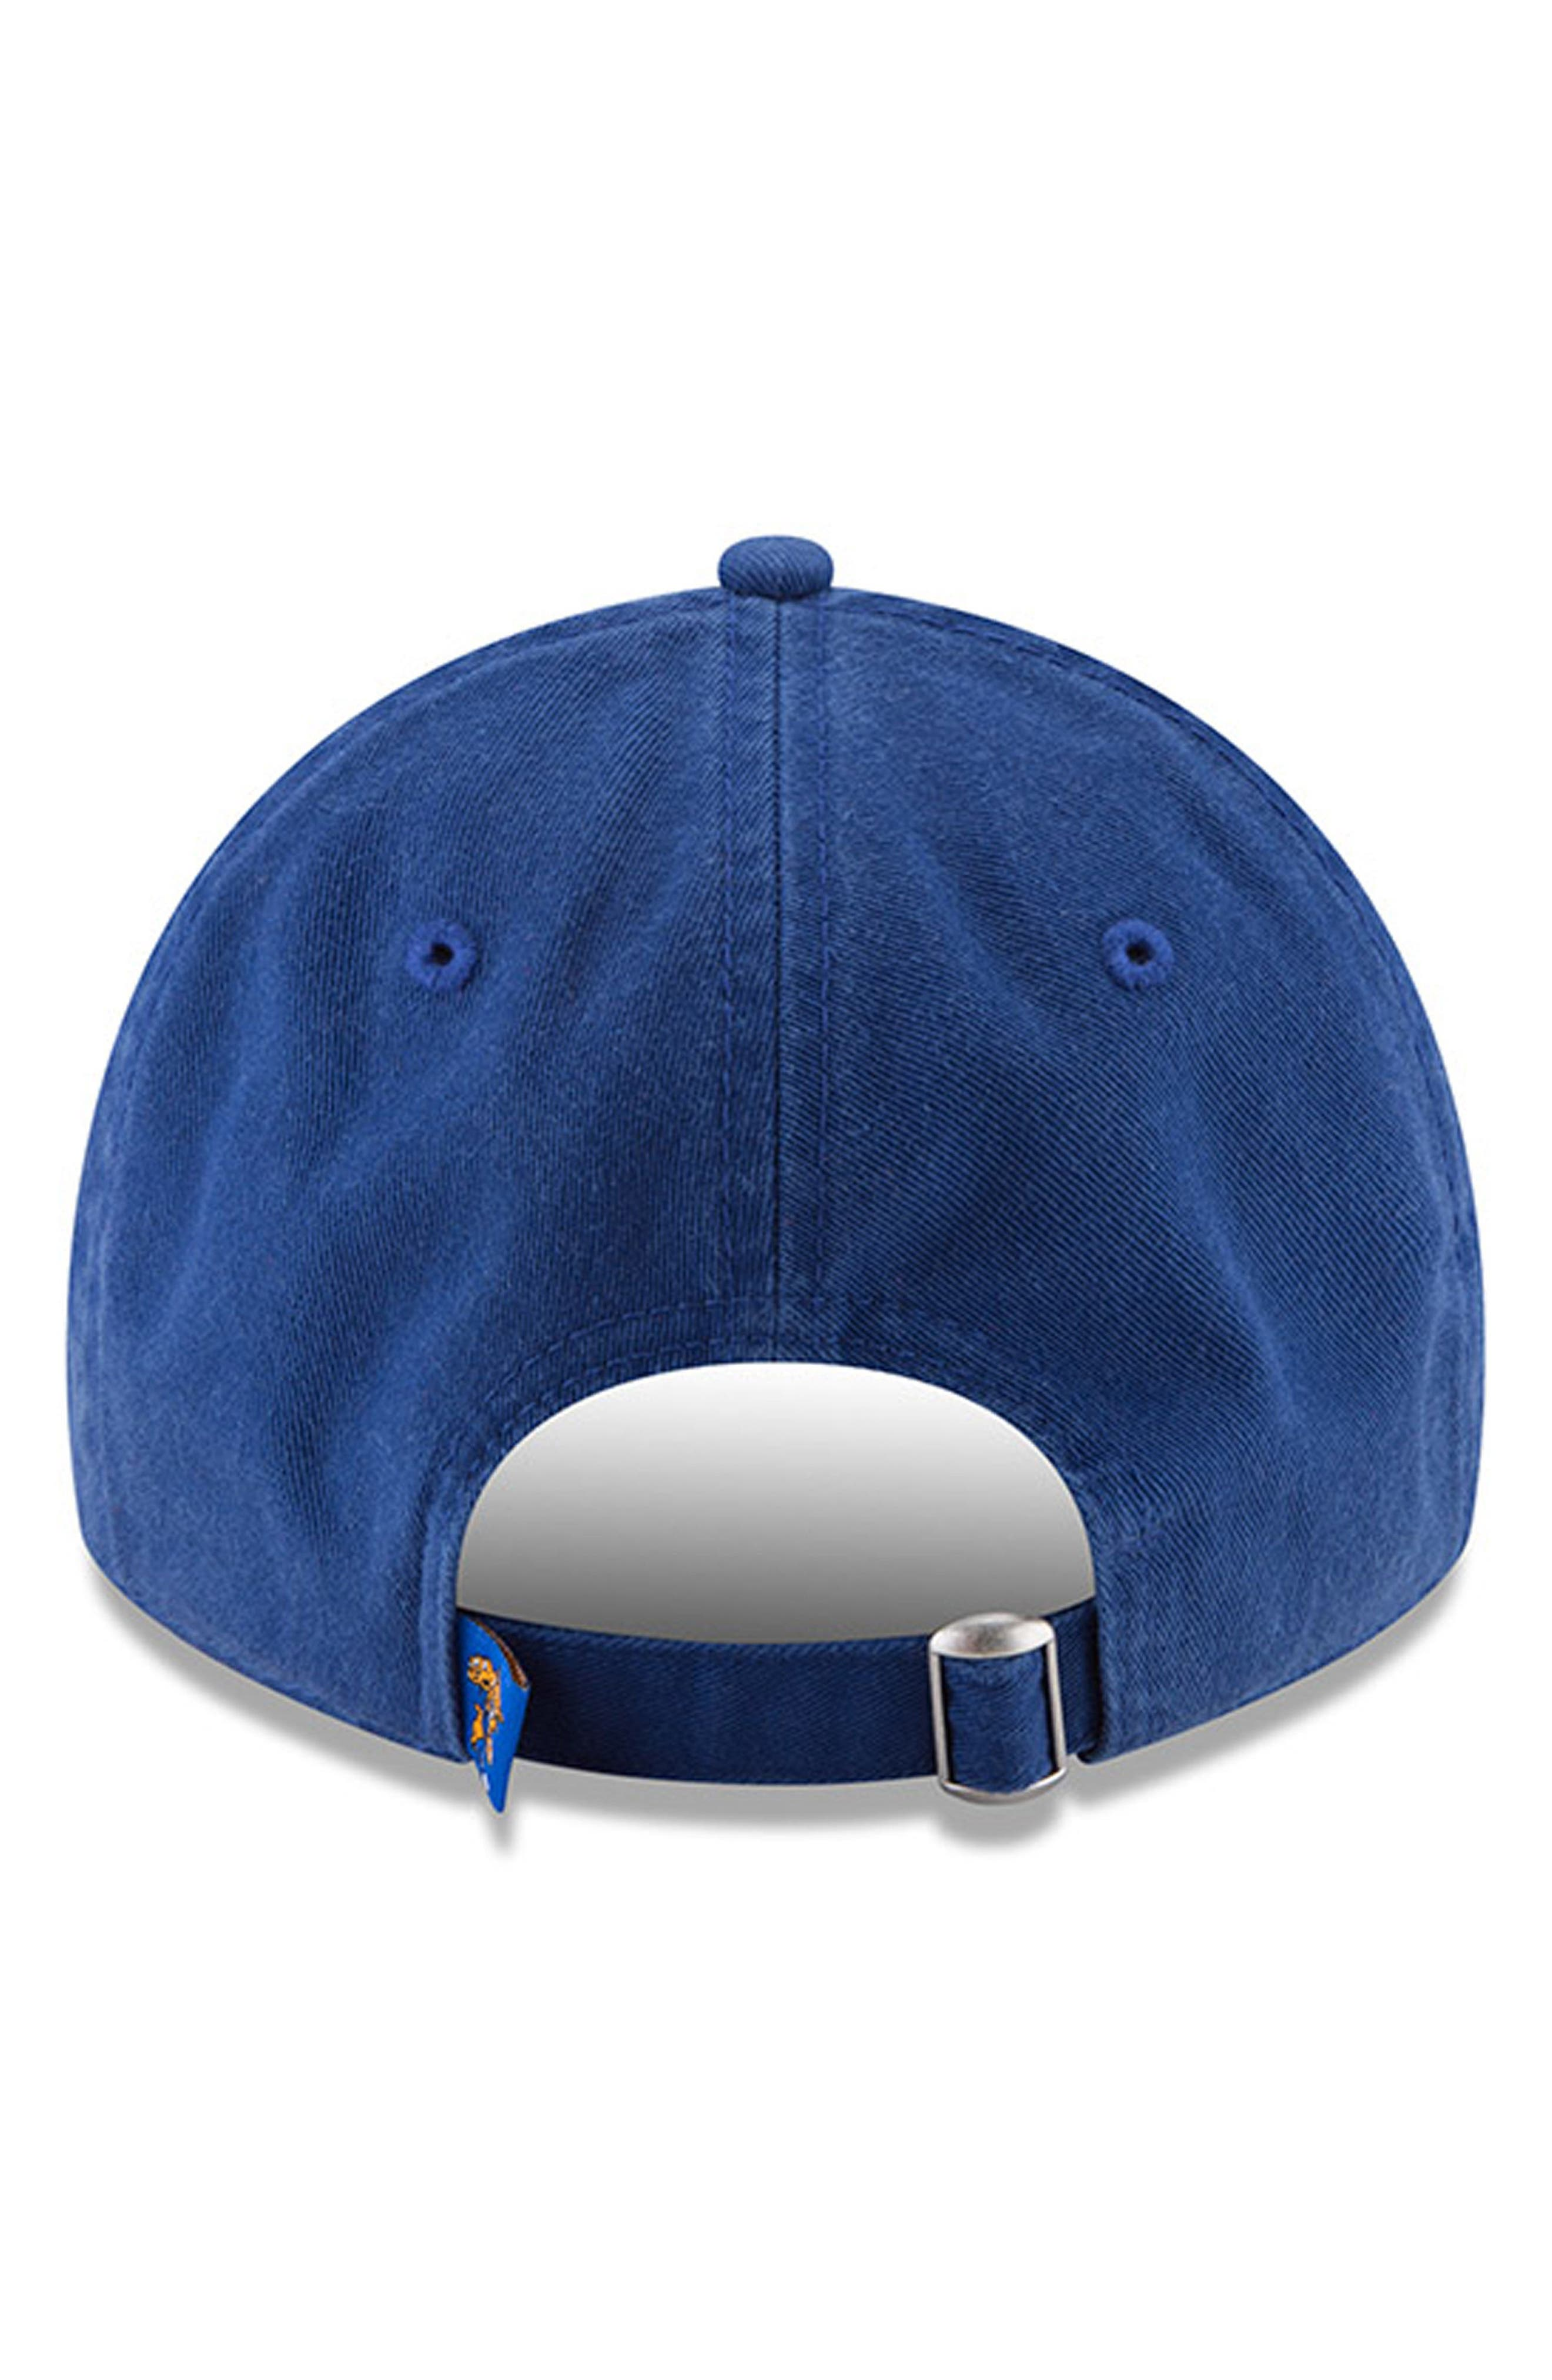 New Era Collegiate Core Classic - Kentucky Wildcats Baseball Cap,                             Alternate thumbnail 3, color,